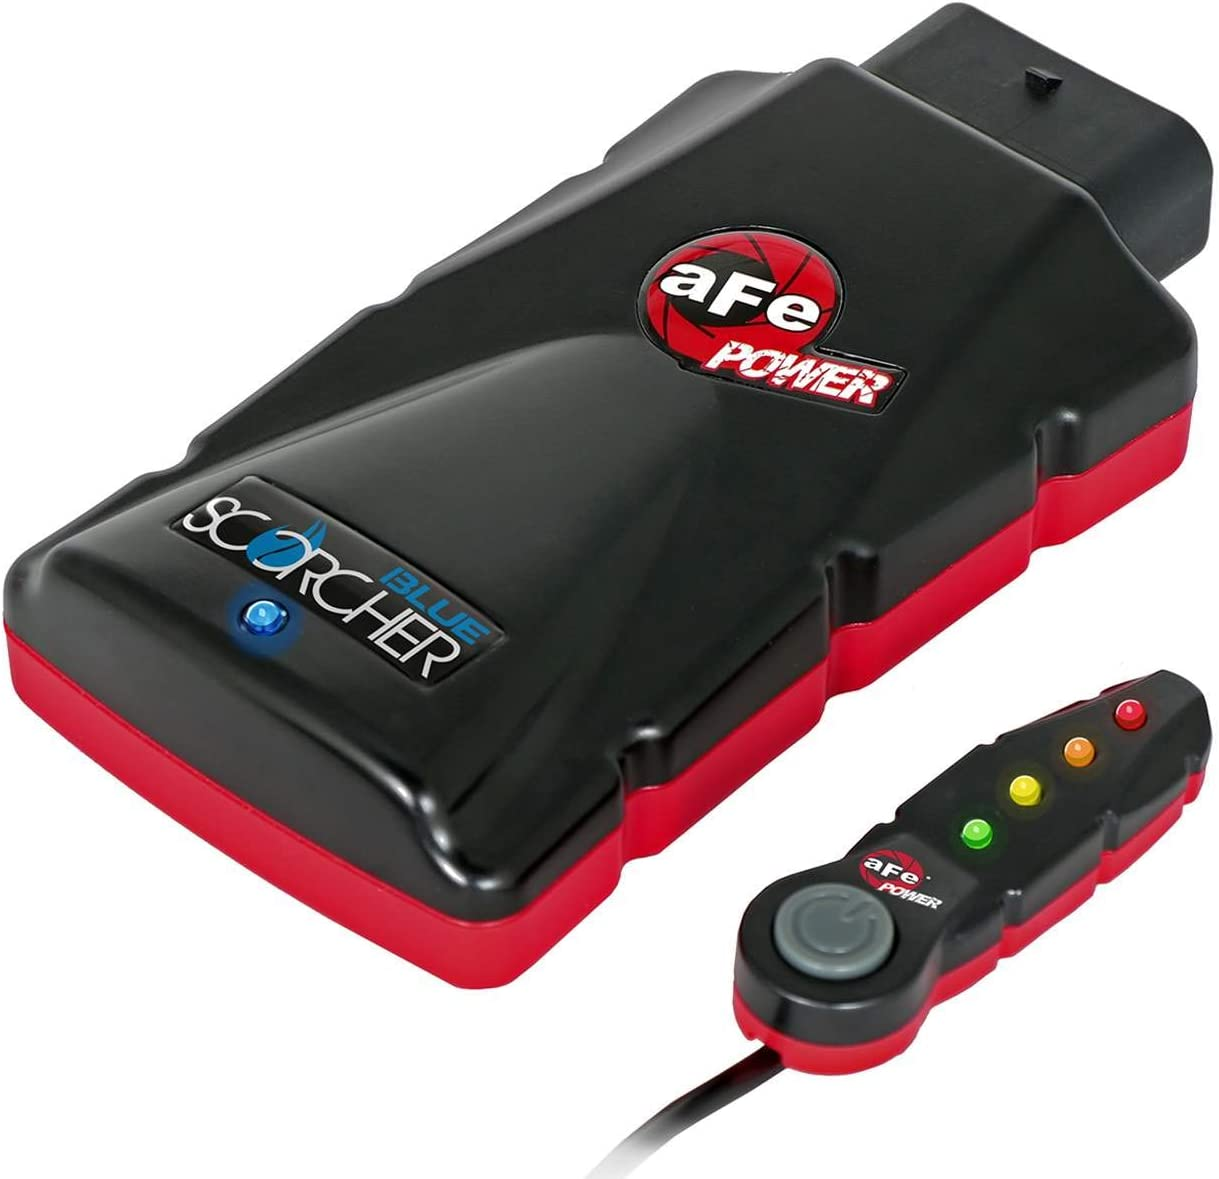 aFe Power 77-83023 SCORCHER BLUE Bluetooth Power Module